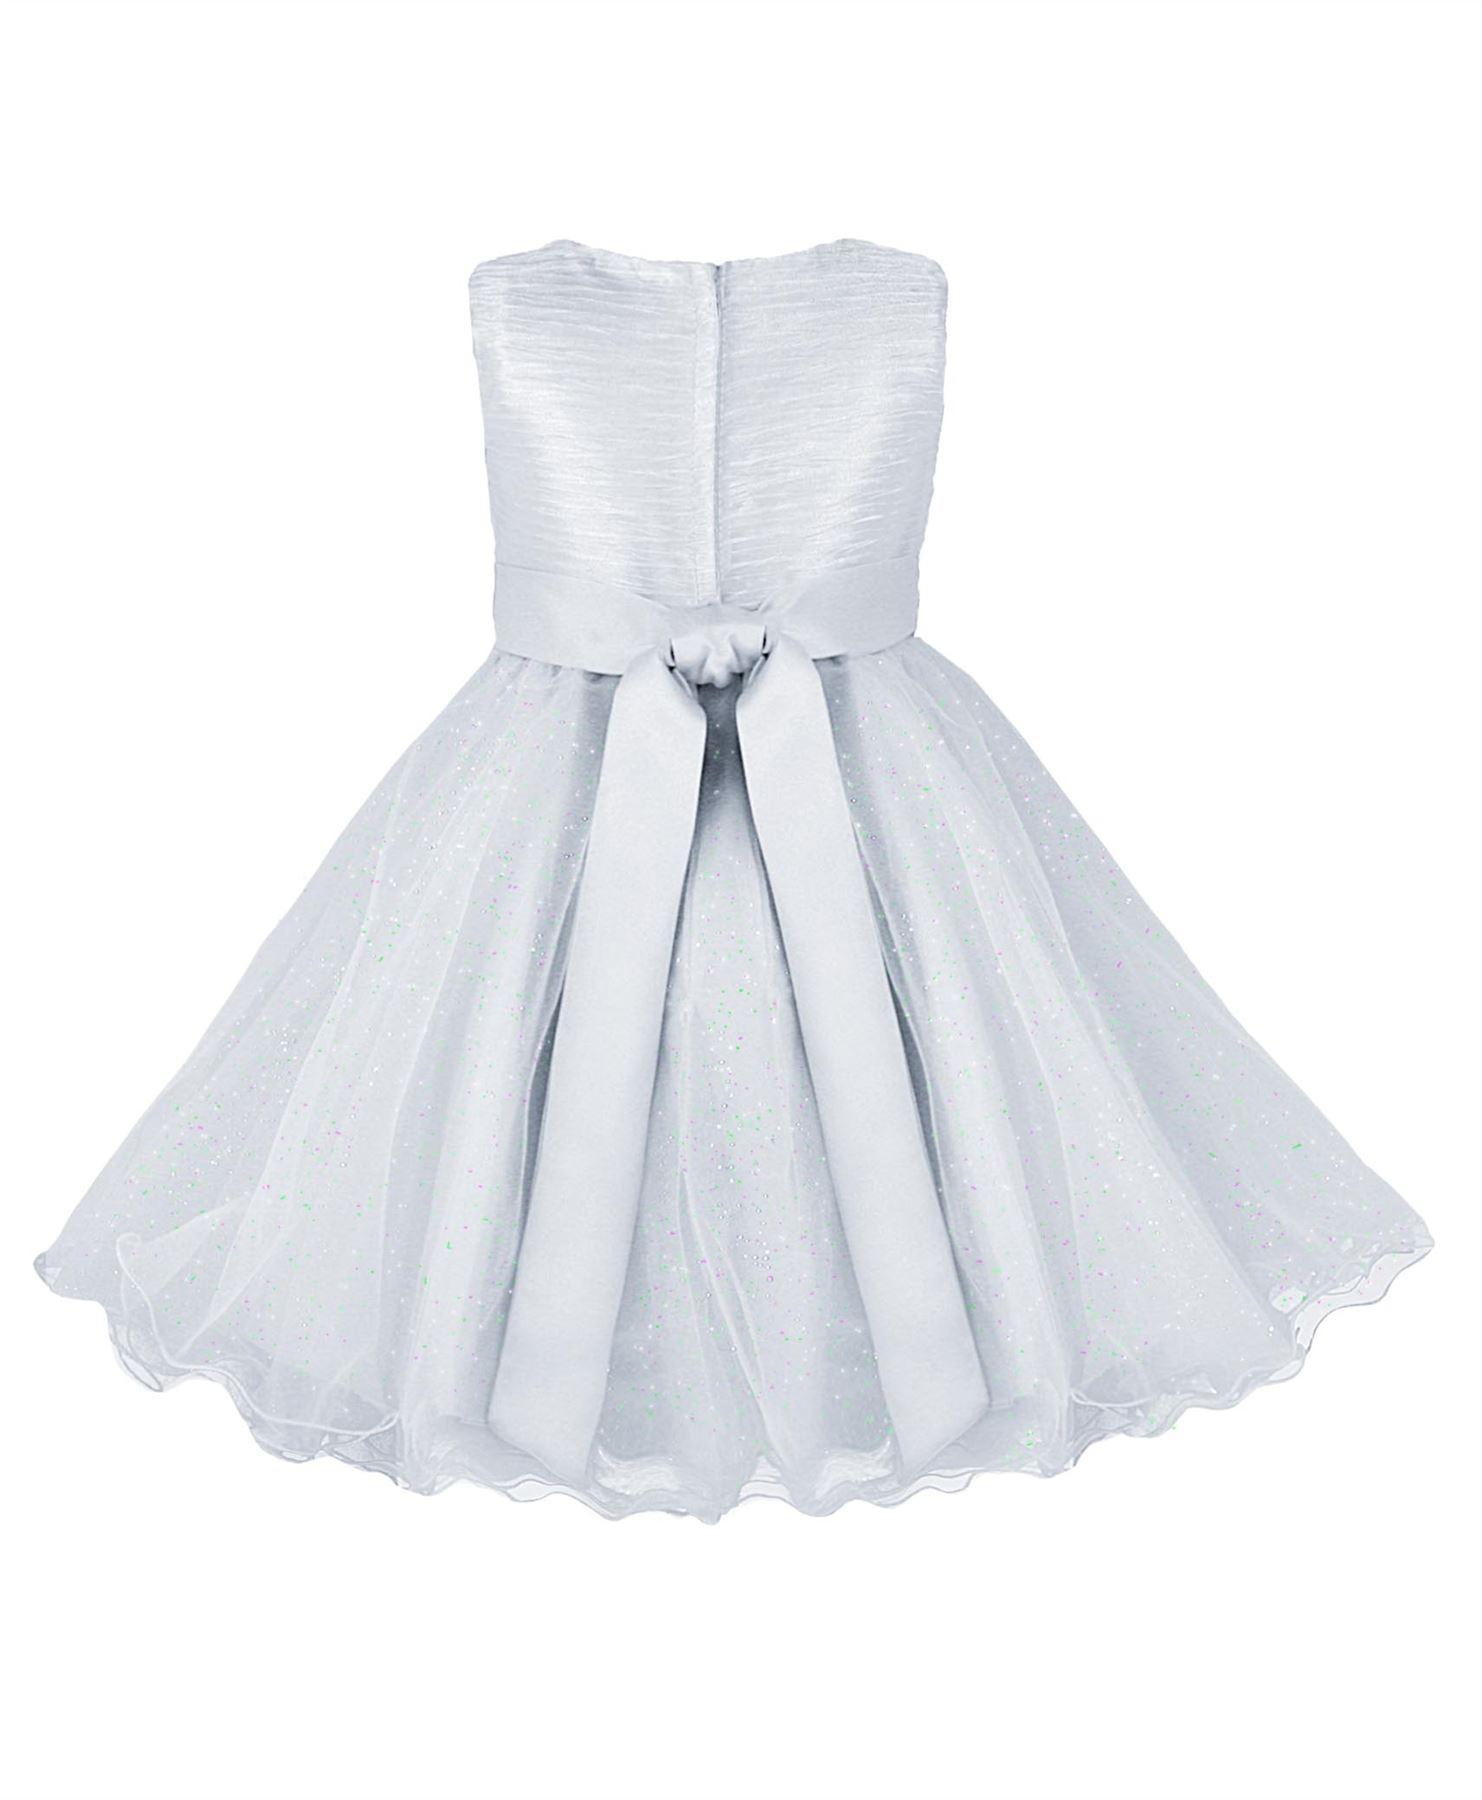 Fille-Fleur-Mariage-Tulle-fete-detail-n-ud-Robe